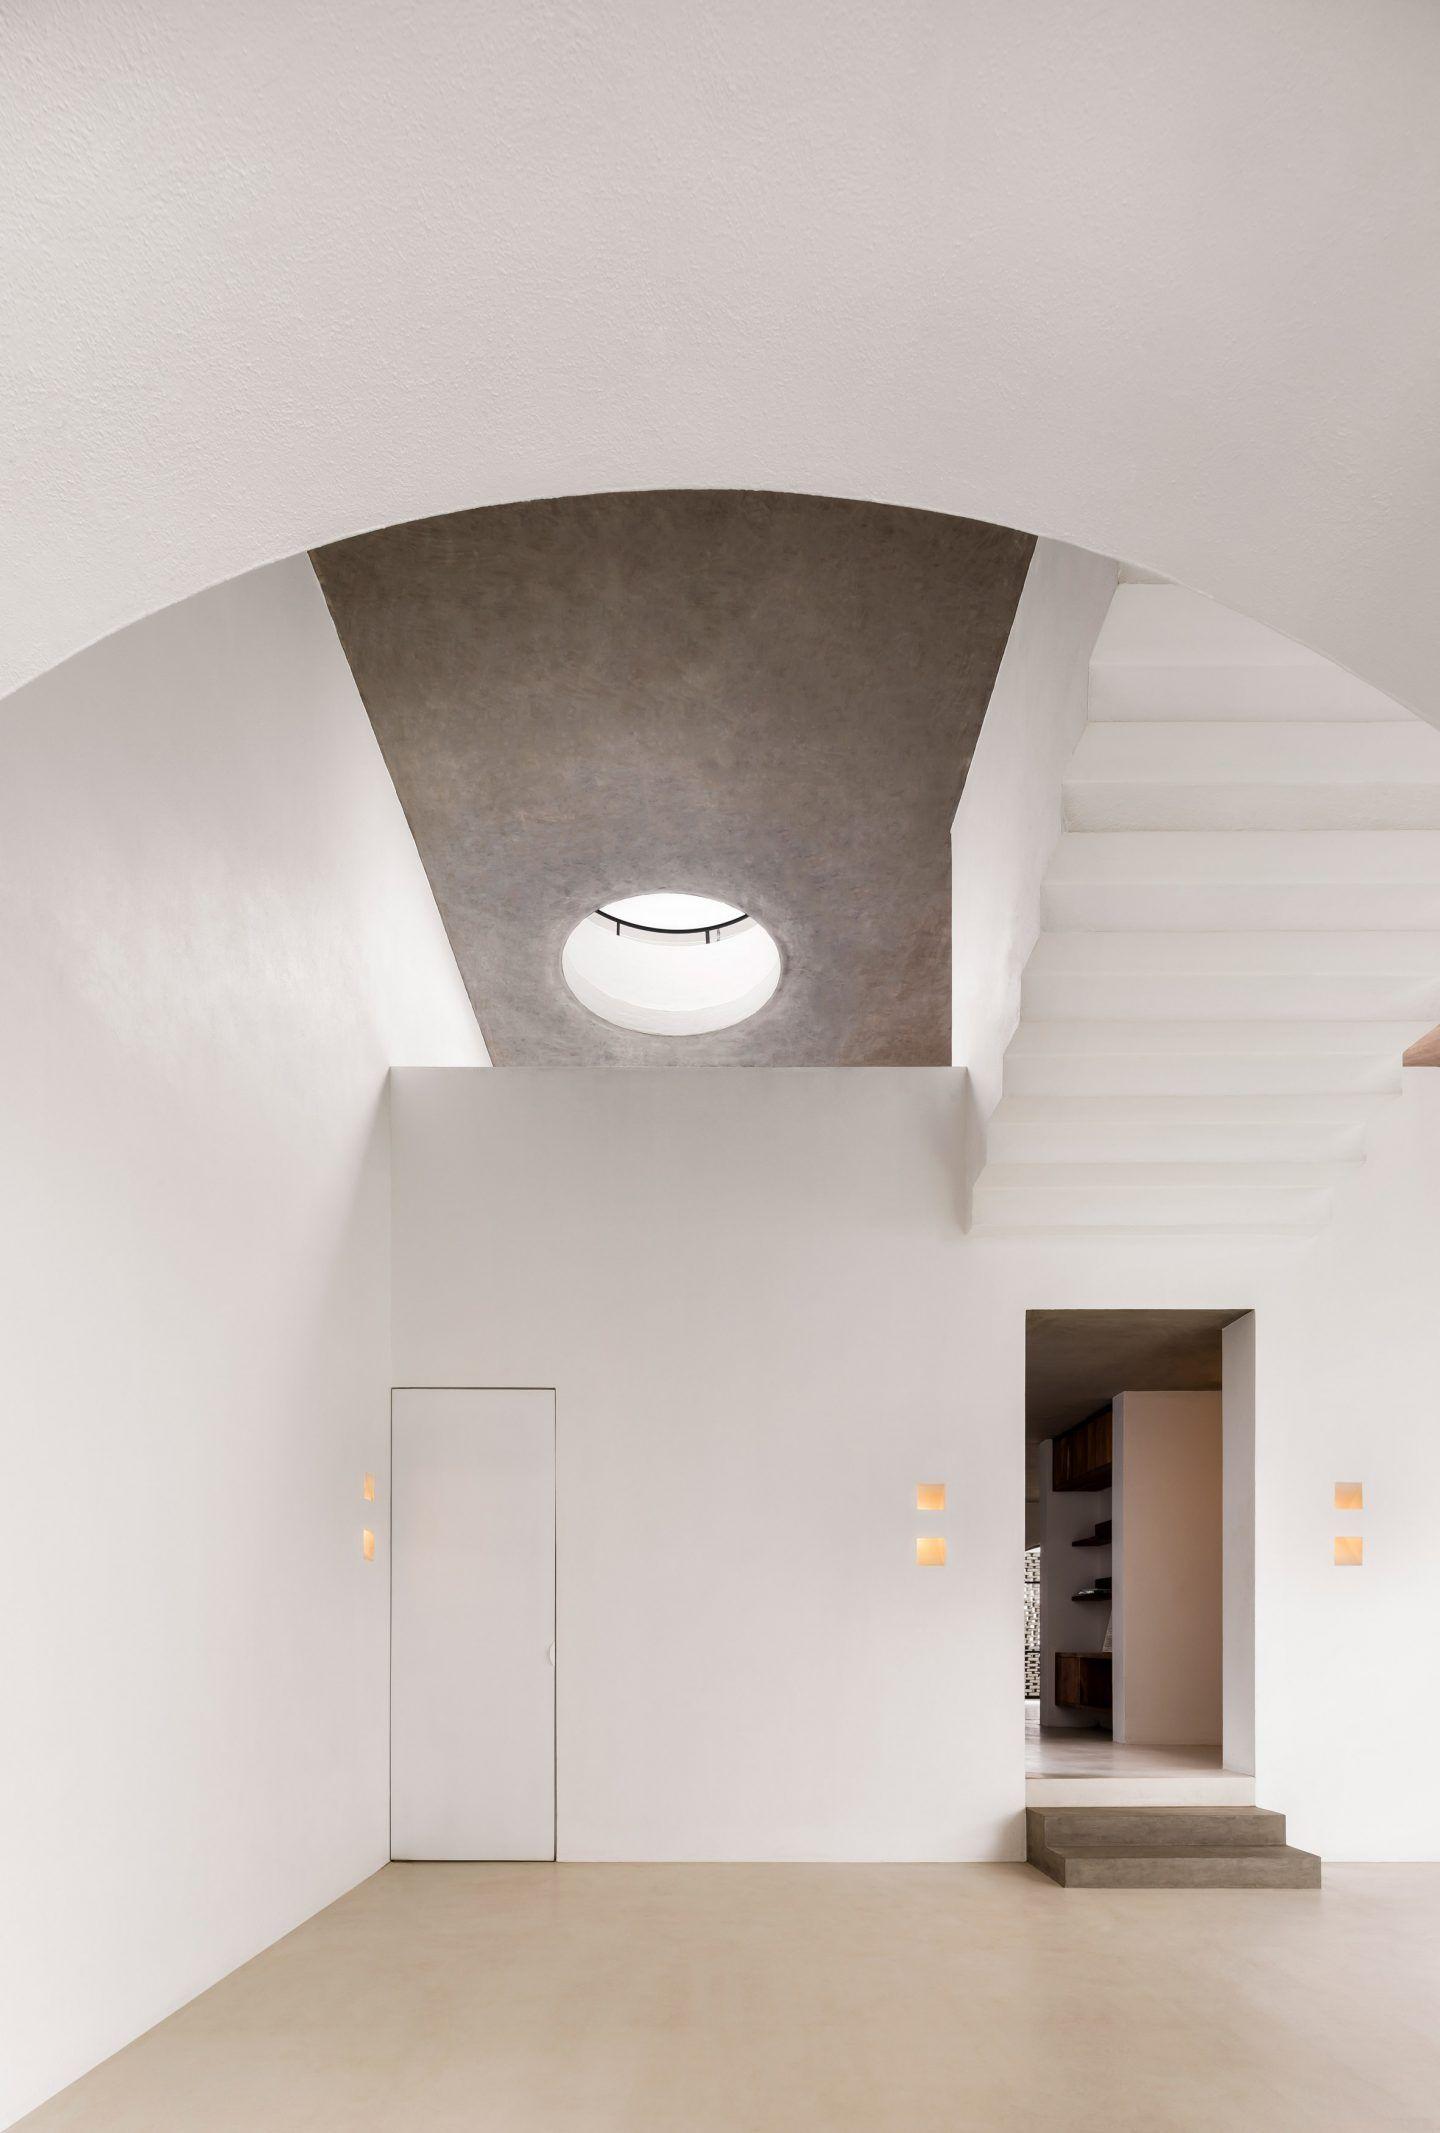 IGNANT-Architecture-Delfino-Lozano-Cesar-Bejar-Casa-690-01